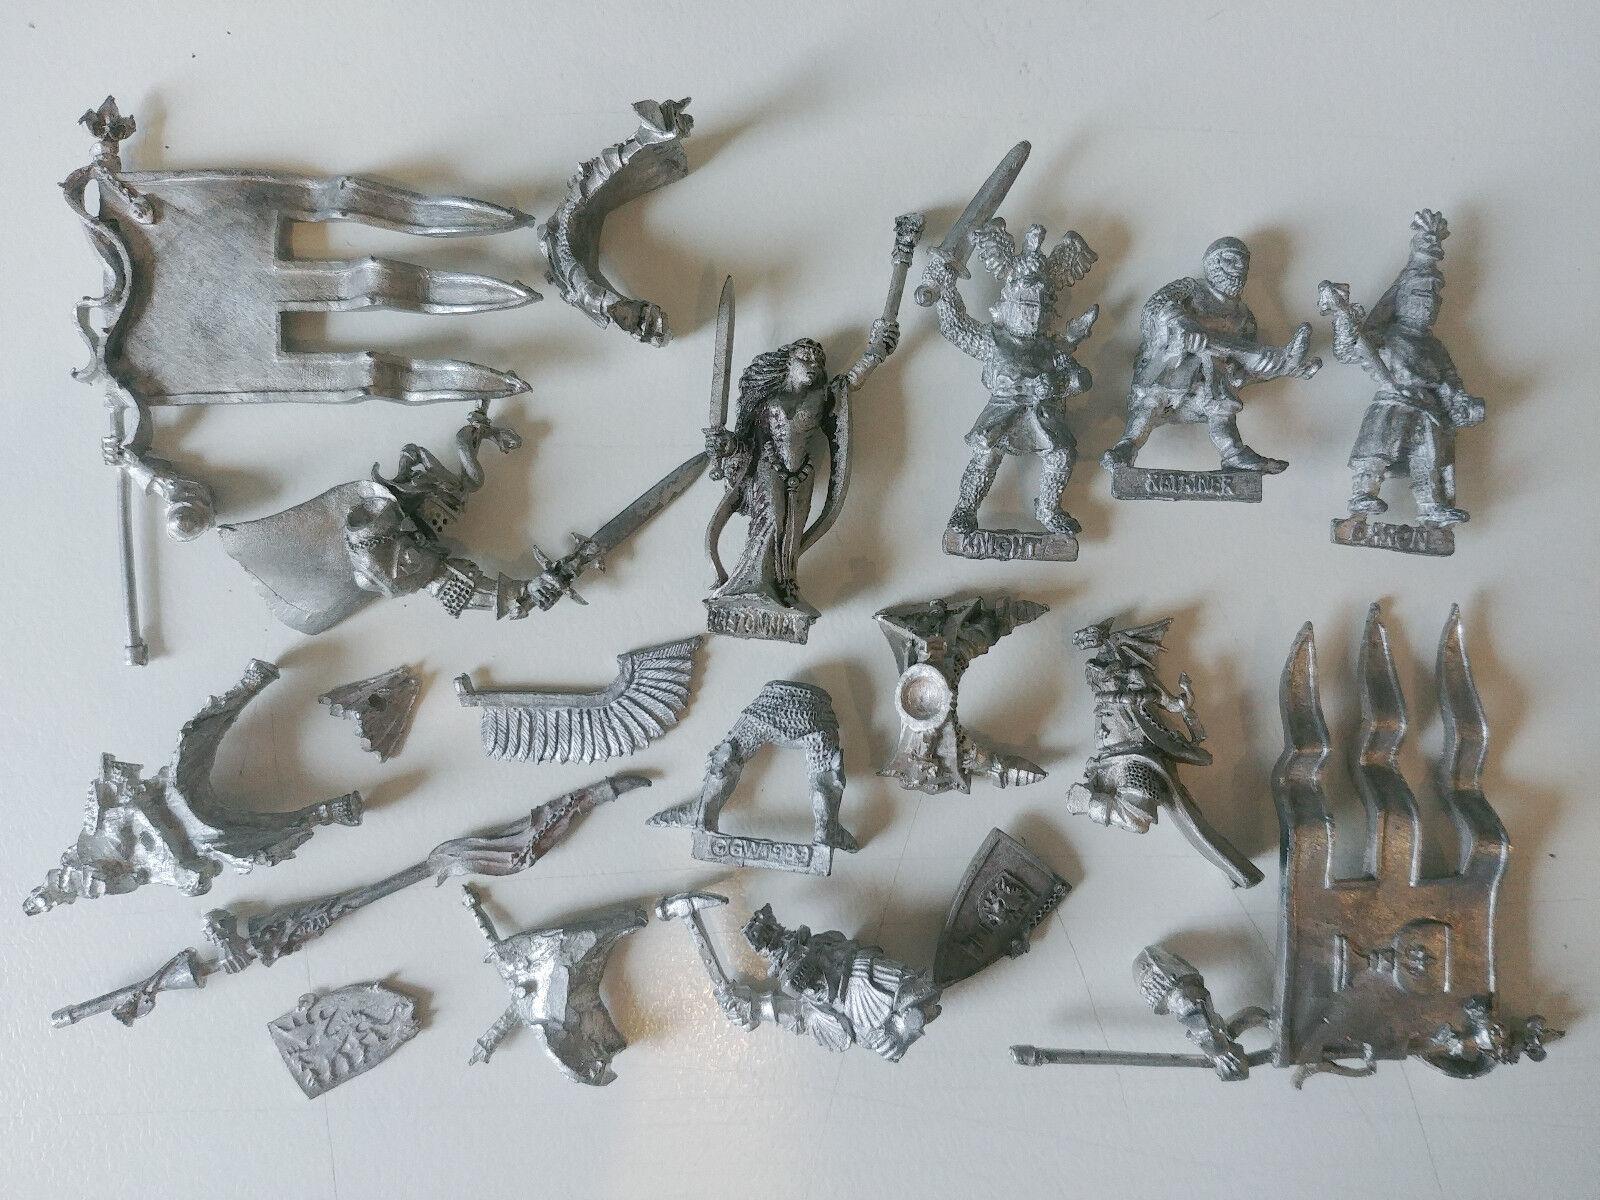 Huge Multi-listing Bretonnian Knights Grail Lord Sorceress Metal models Rare OOP